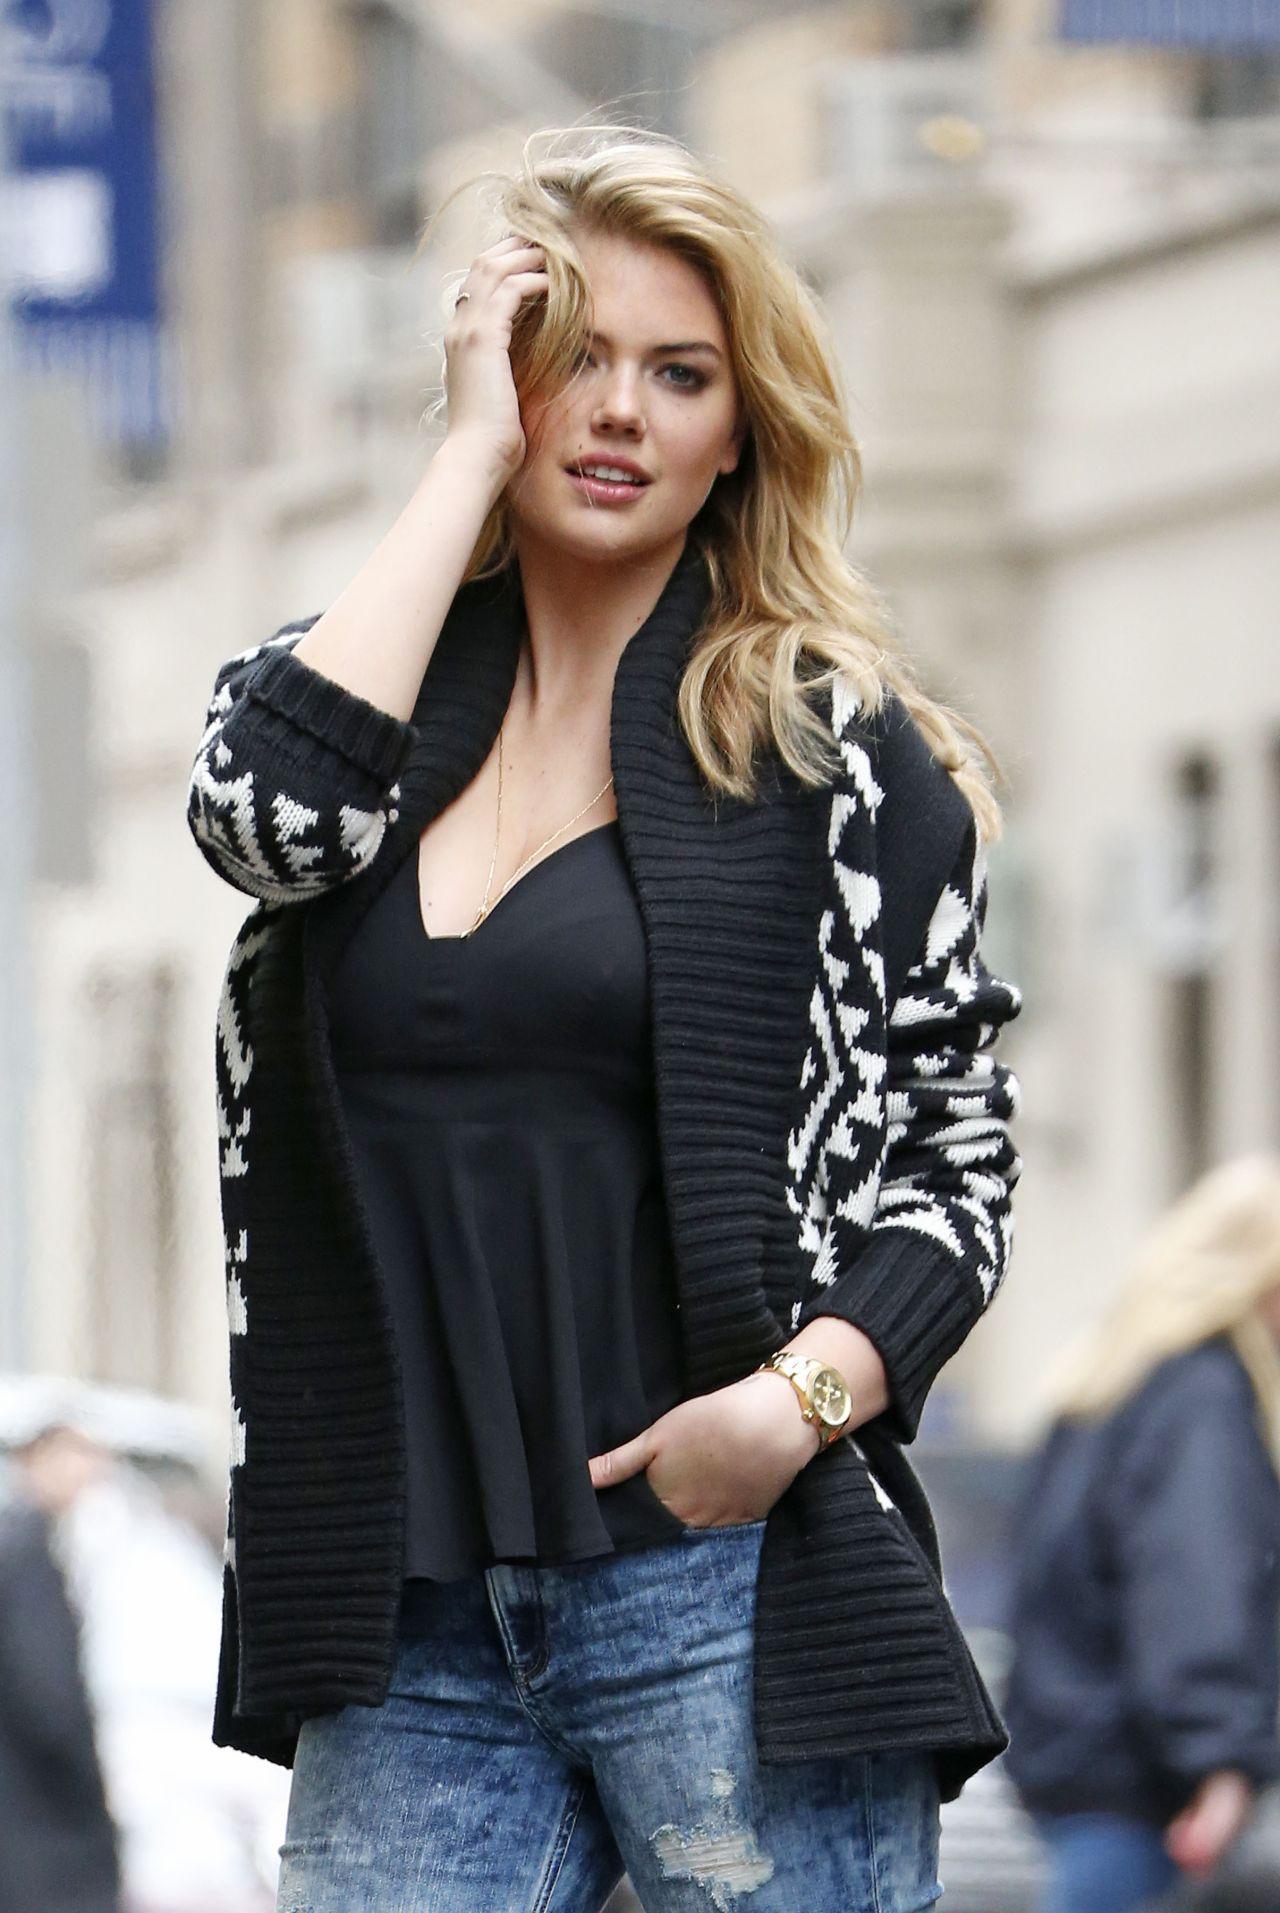 Danielle williams porn star